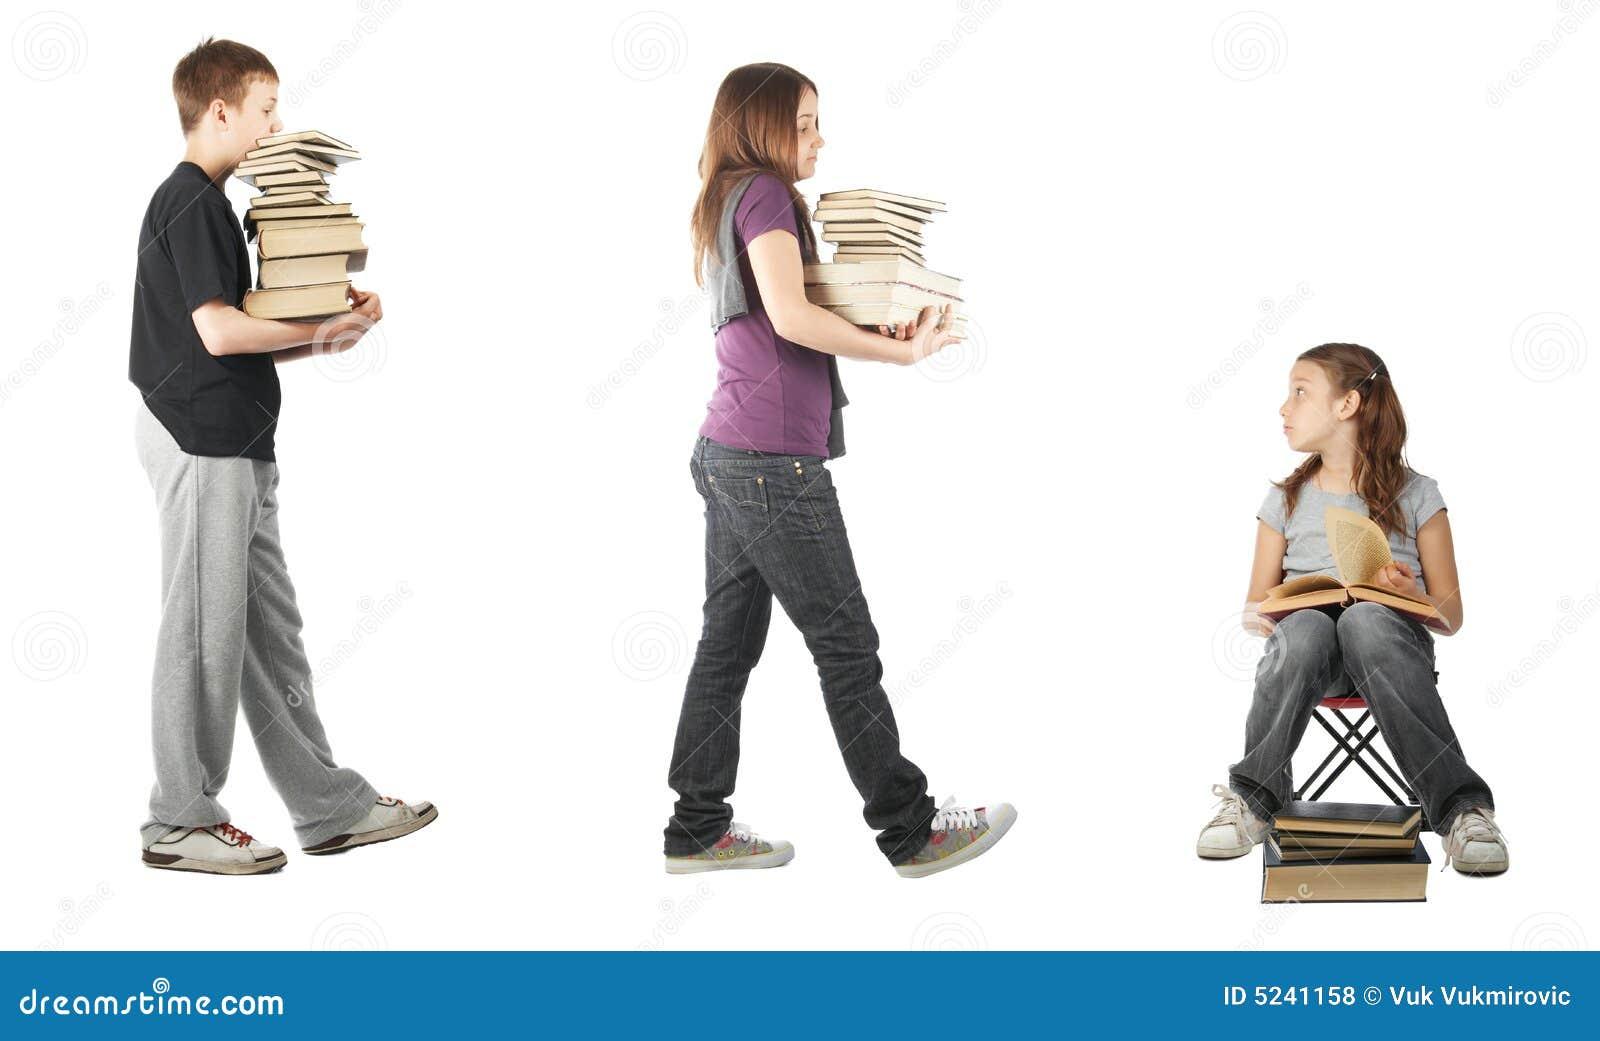 Catching up on homework